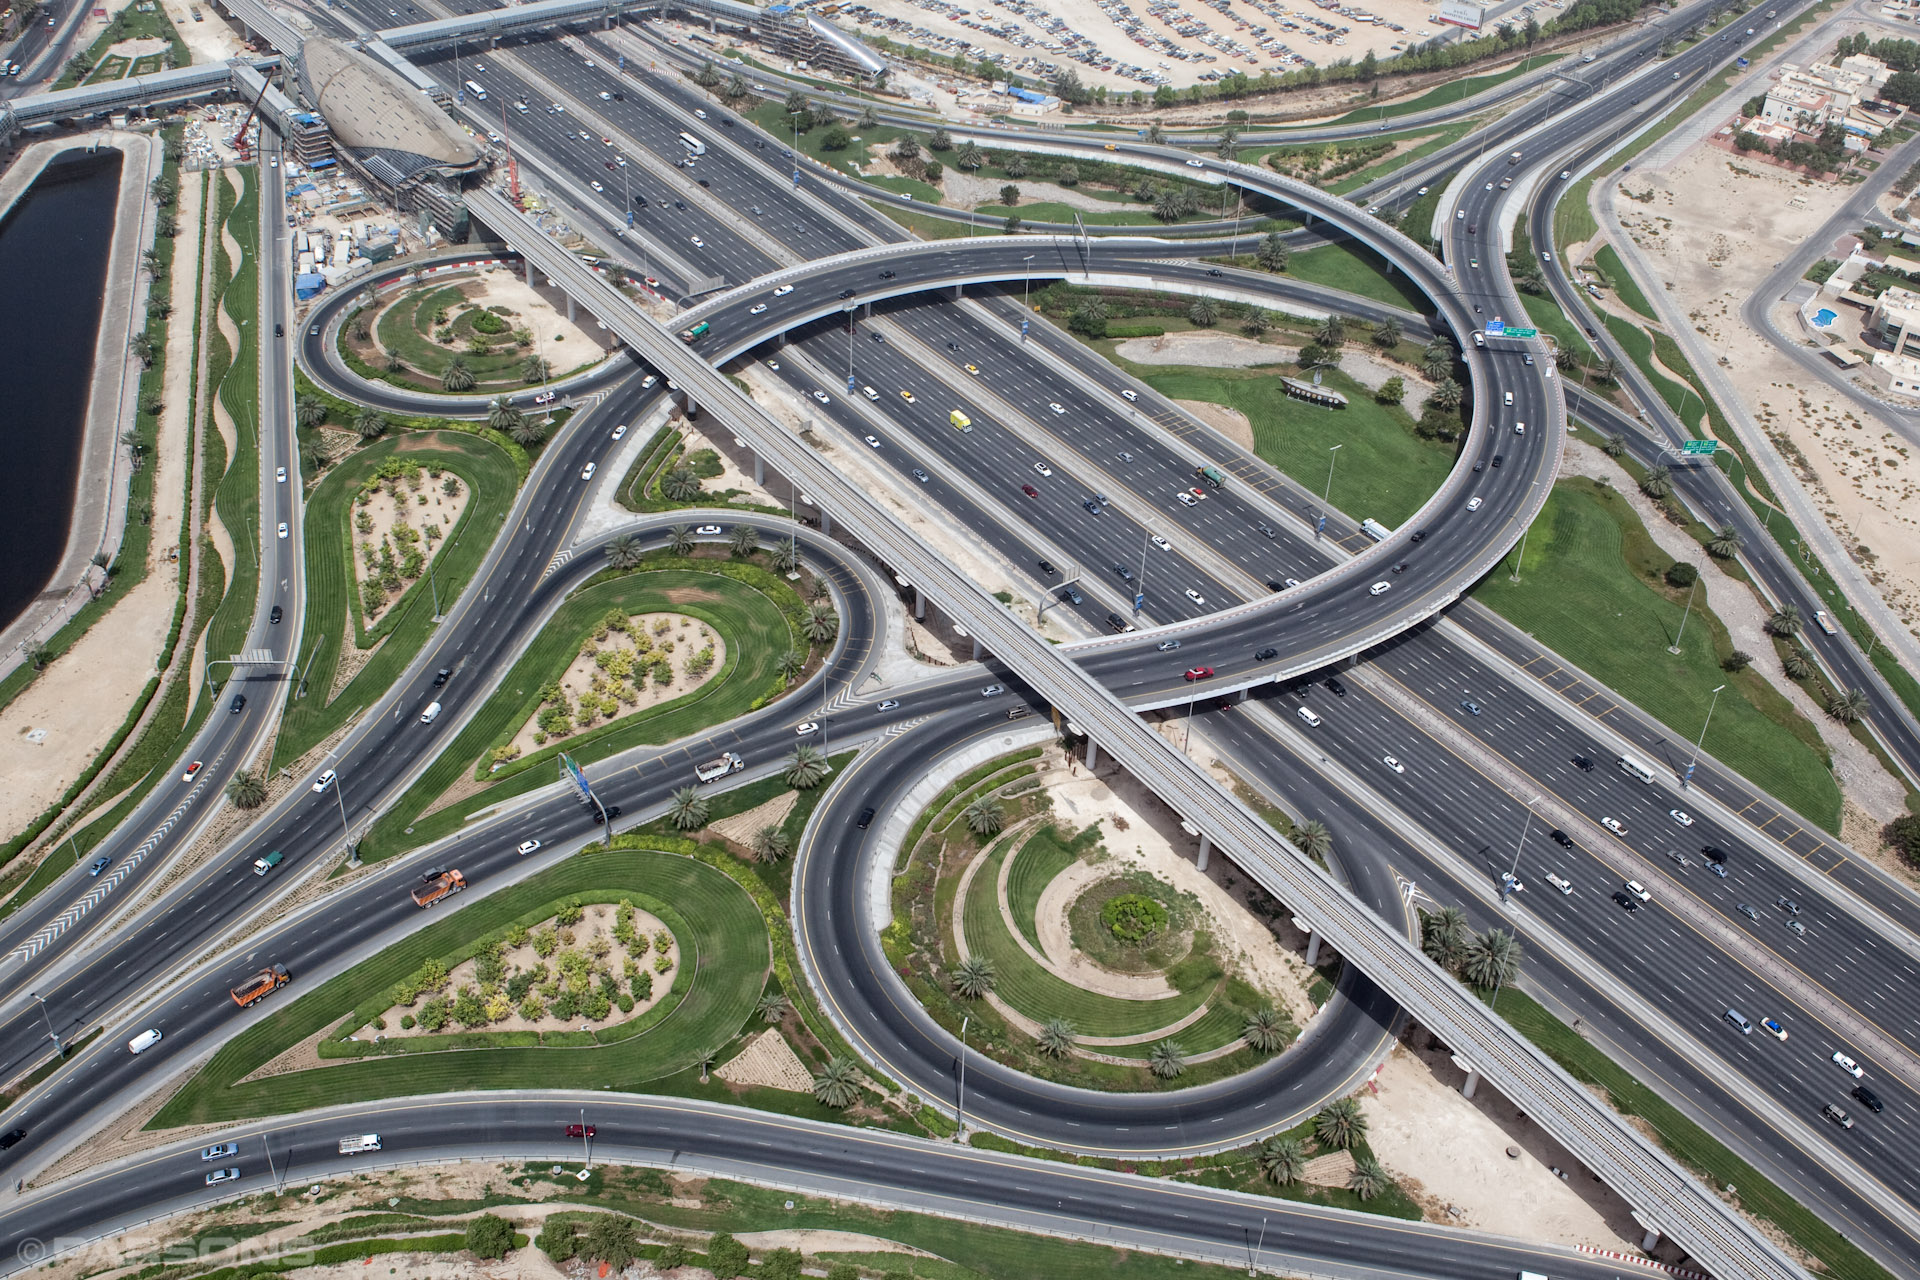 Civil-Engineering-Aerial-Dubai-Sheihk-Zayed-Highway-UAE-2.JPG